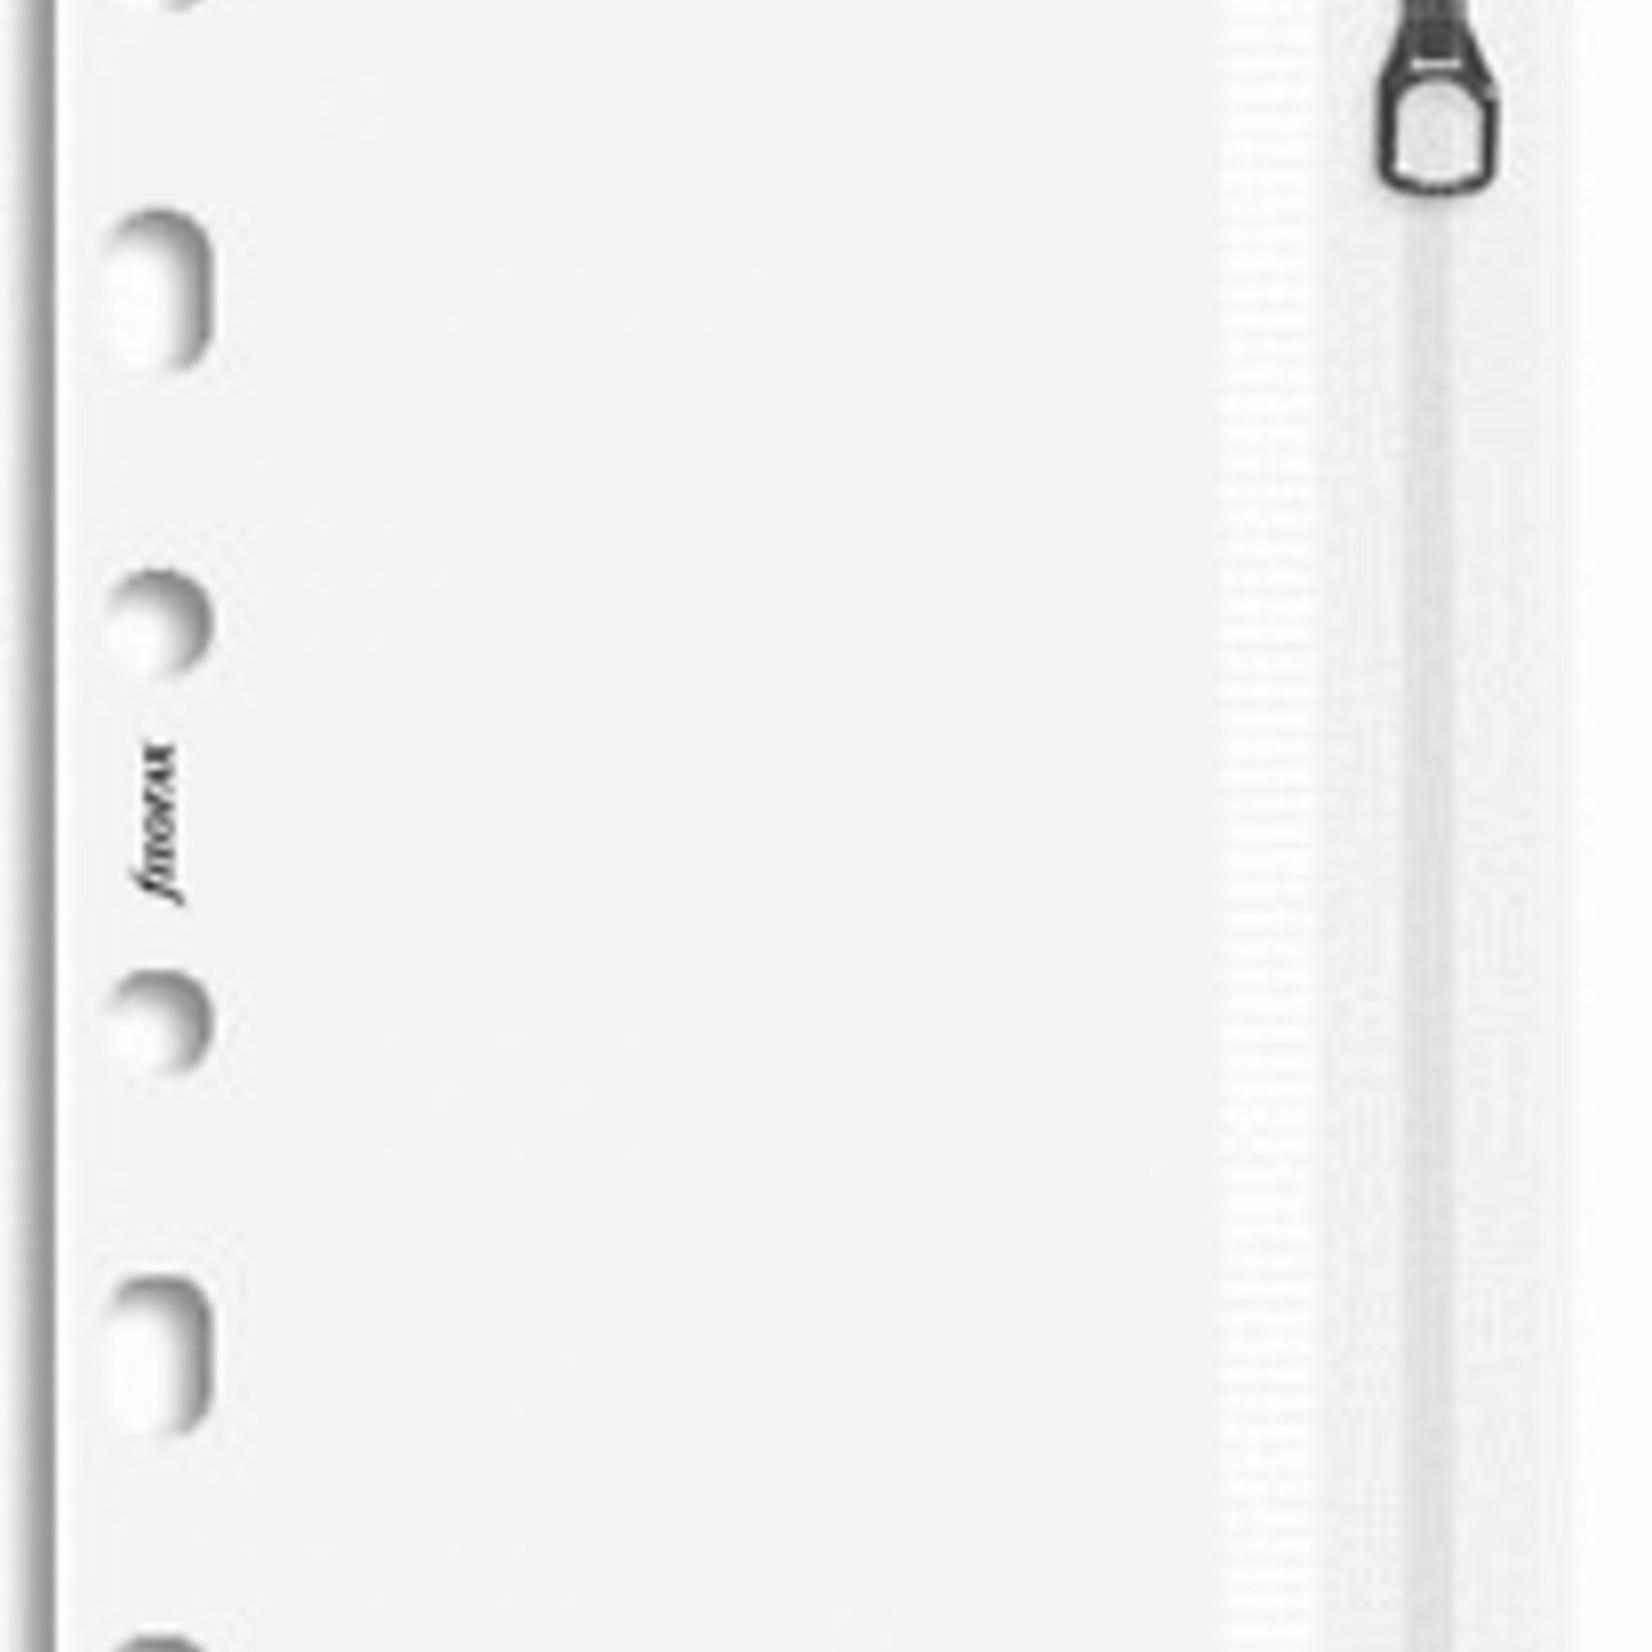 Filofax Filofax Einlage Pocket Sichthülle mit Zipp